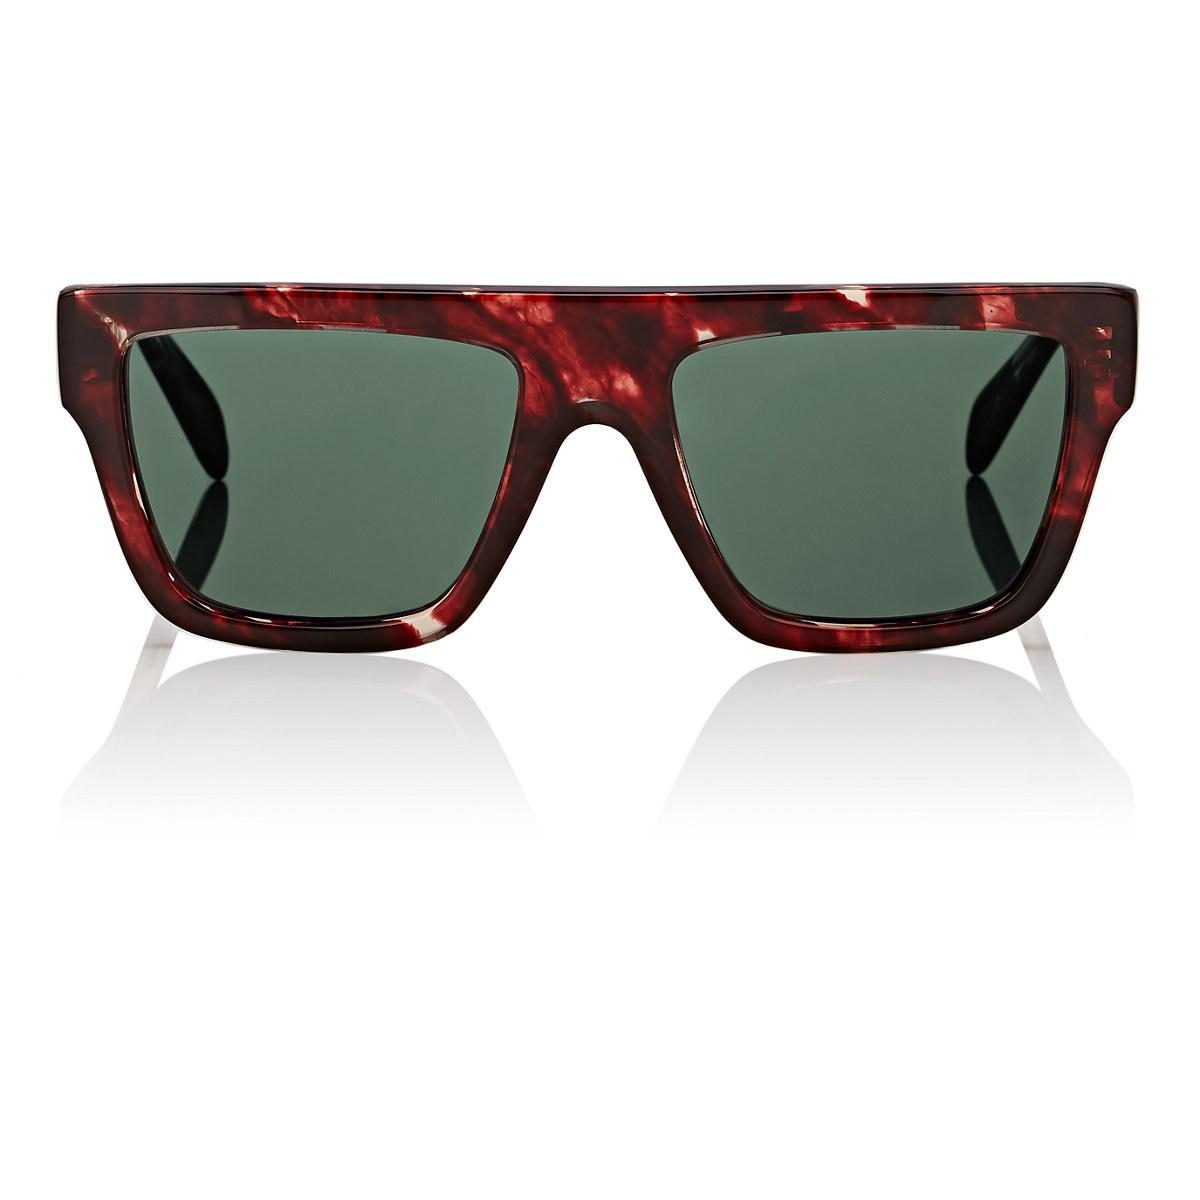 5b72d7fca06 Lyst - Céline Rectangular Aviator Sunglasses in Green